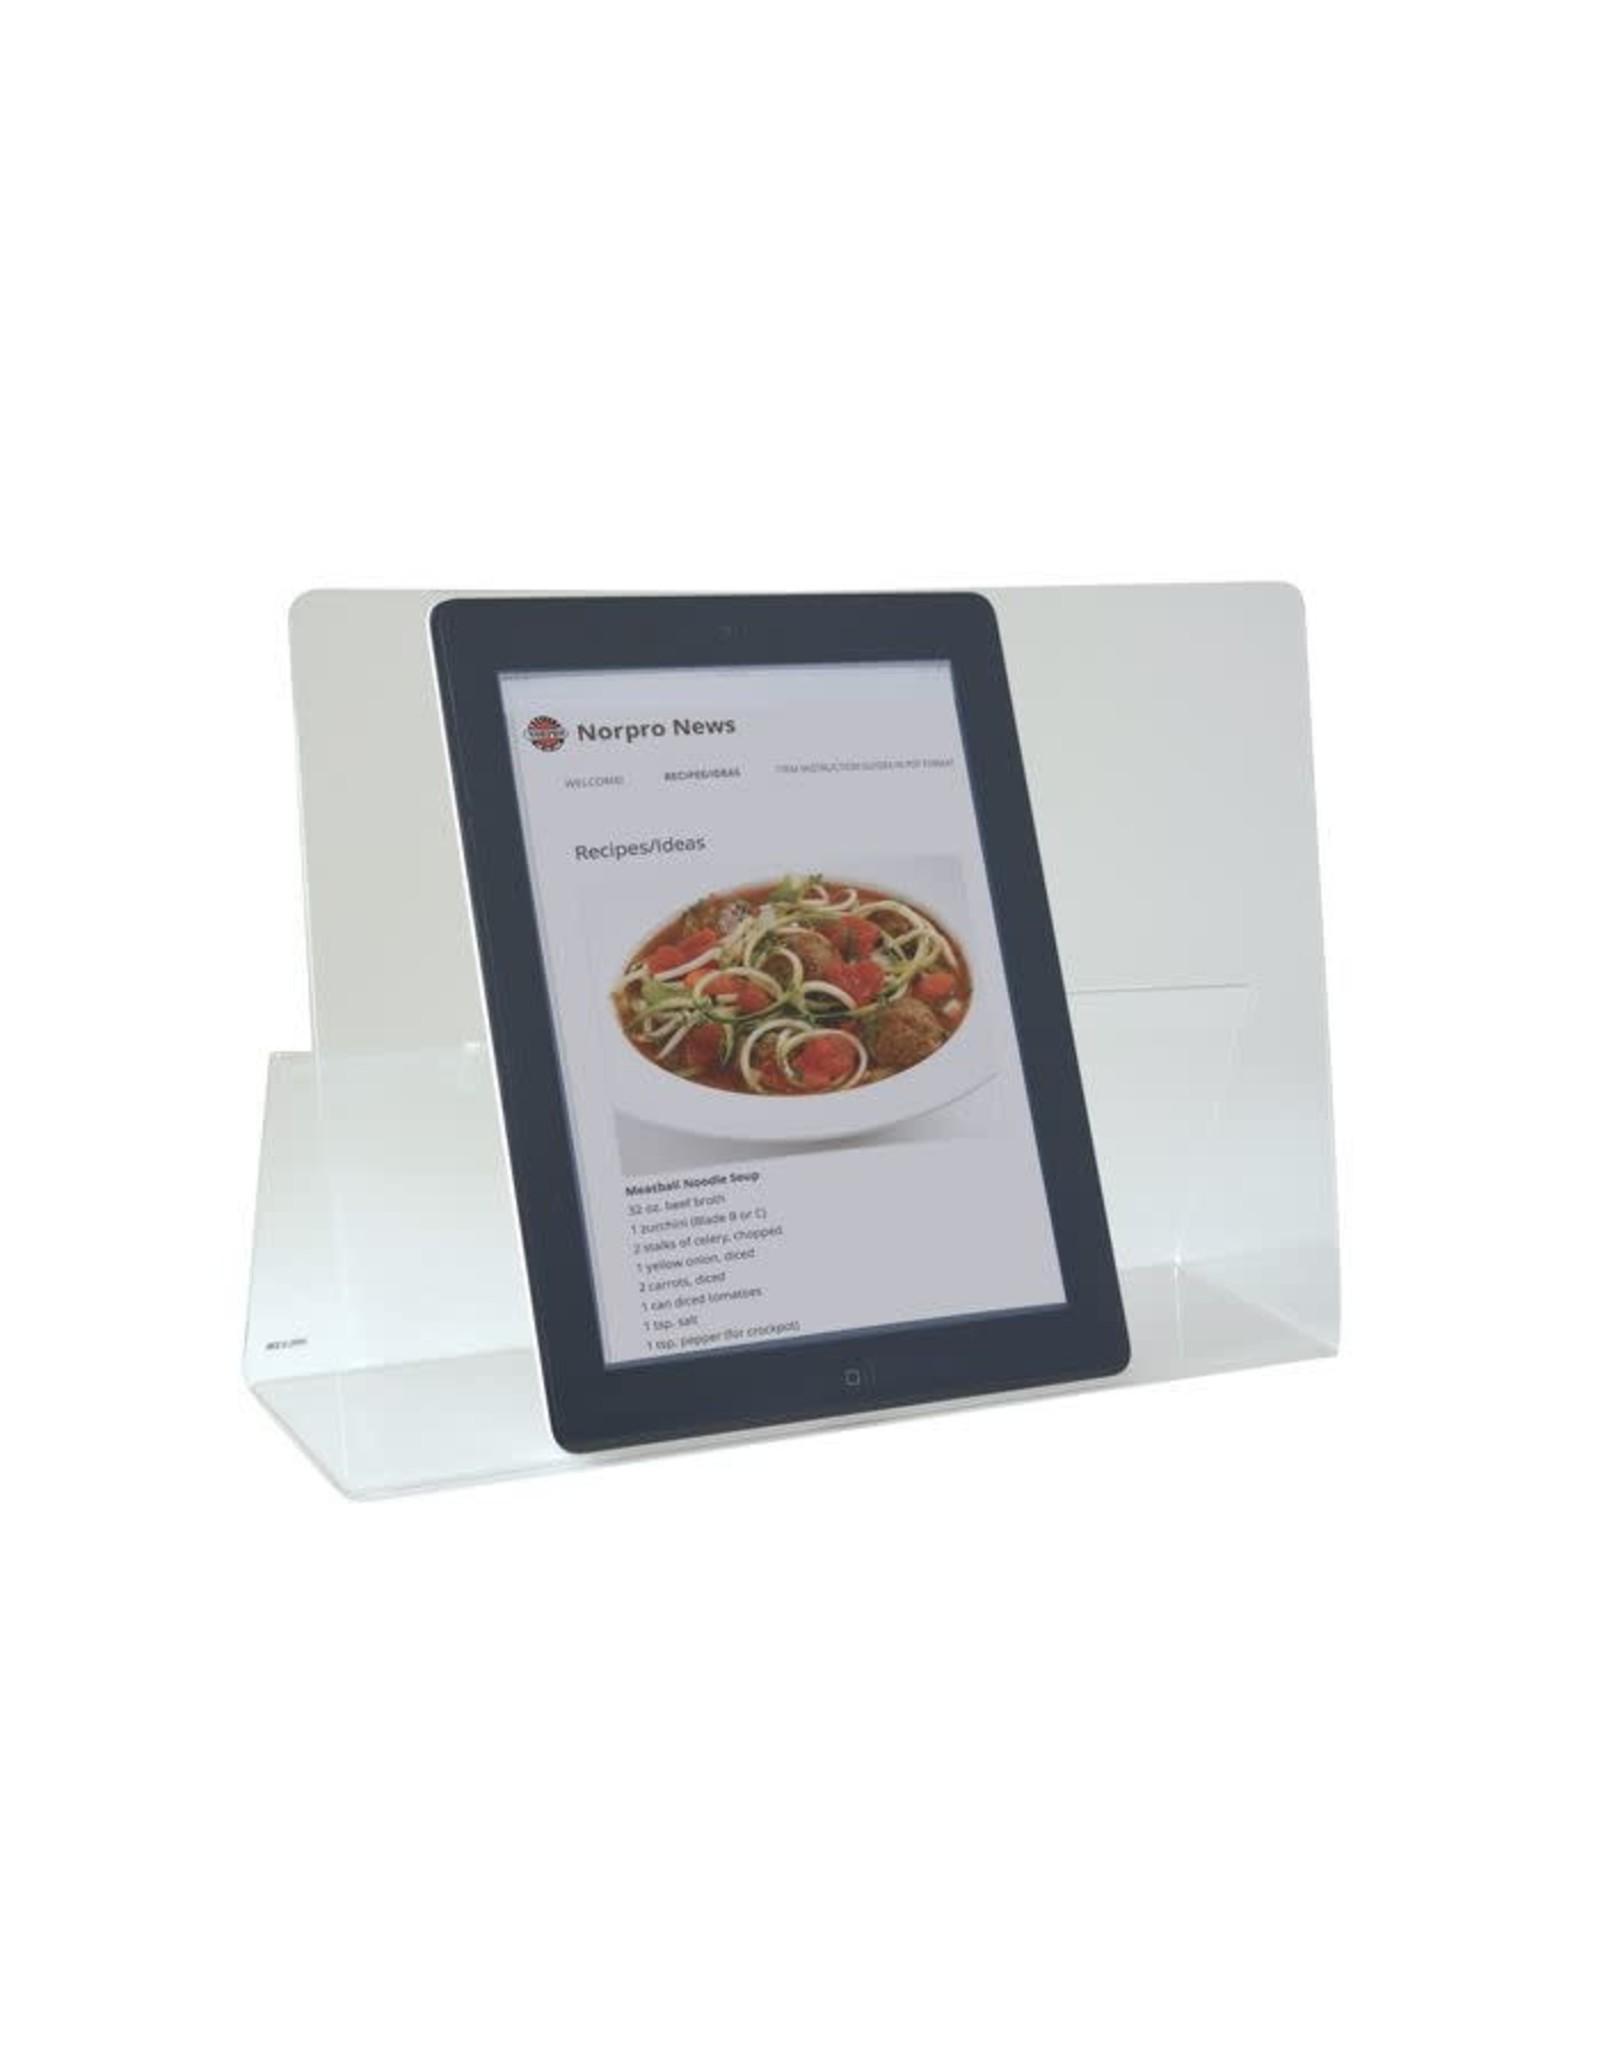 Norpro Acrylic Book, IPad, Tablet Holder